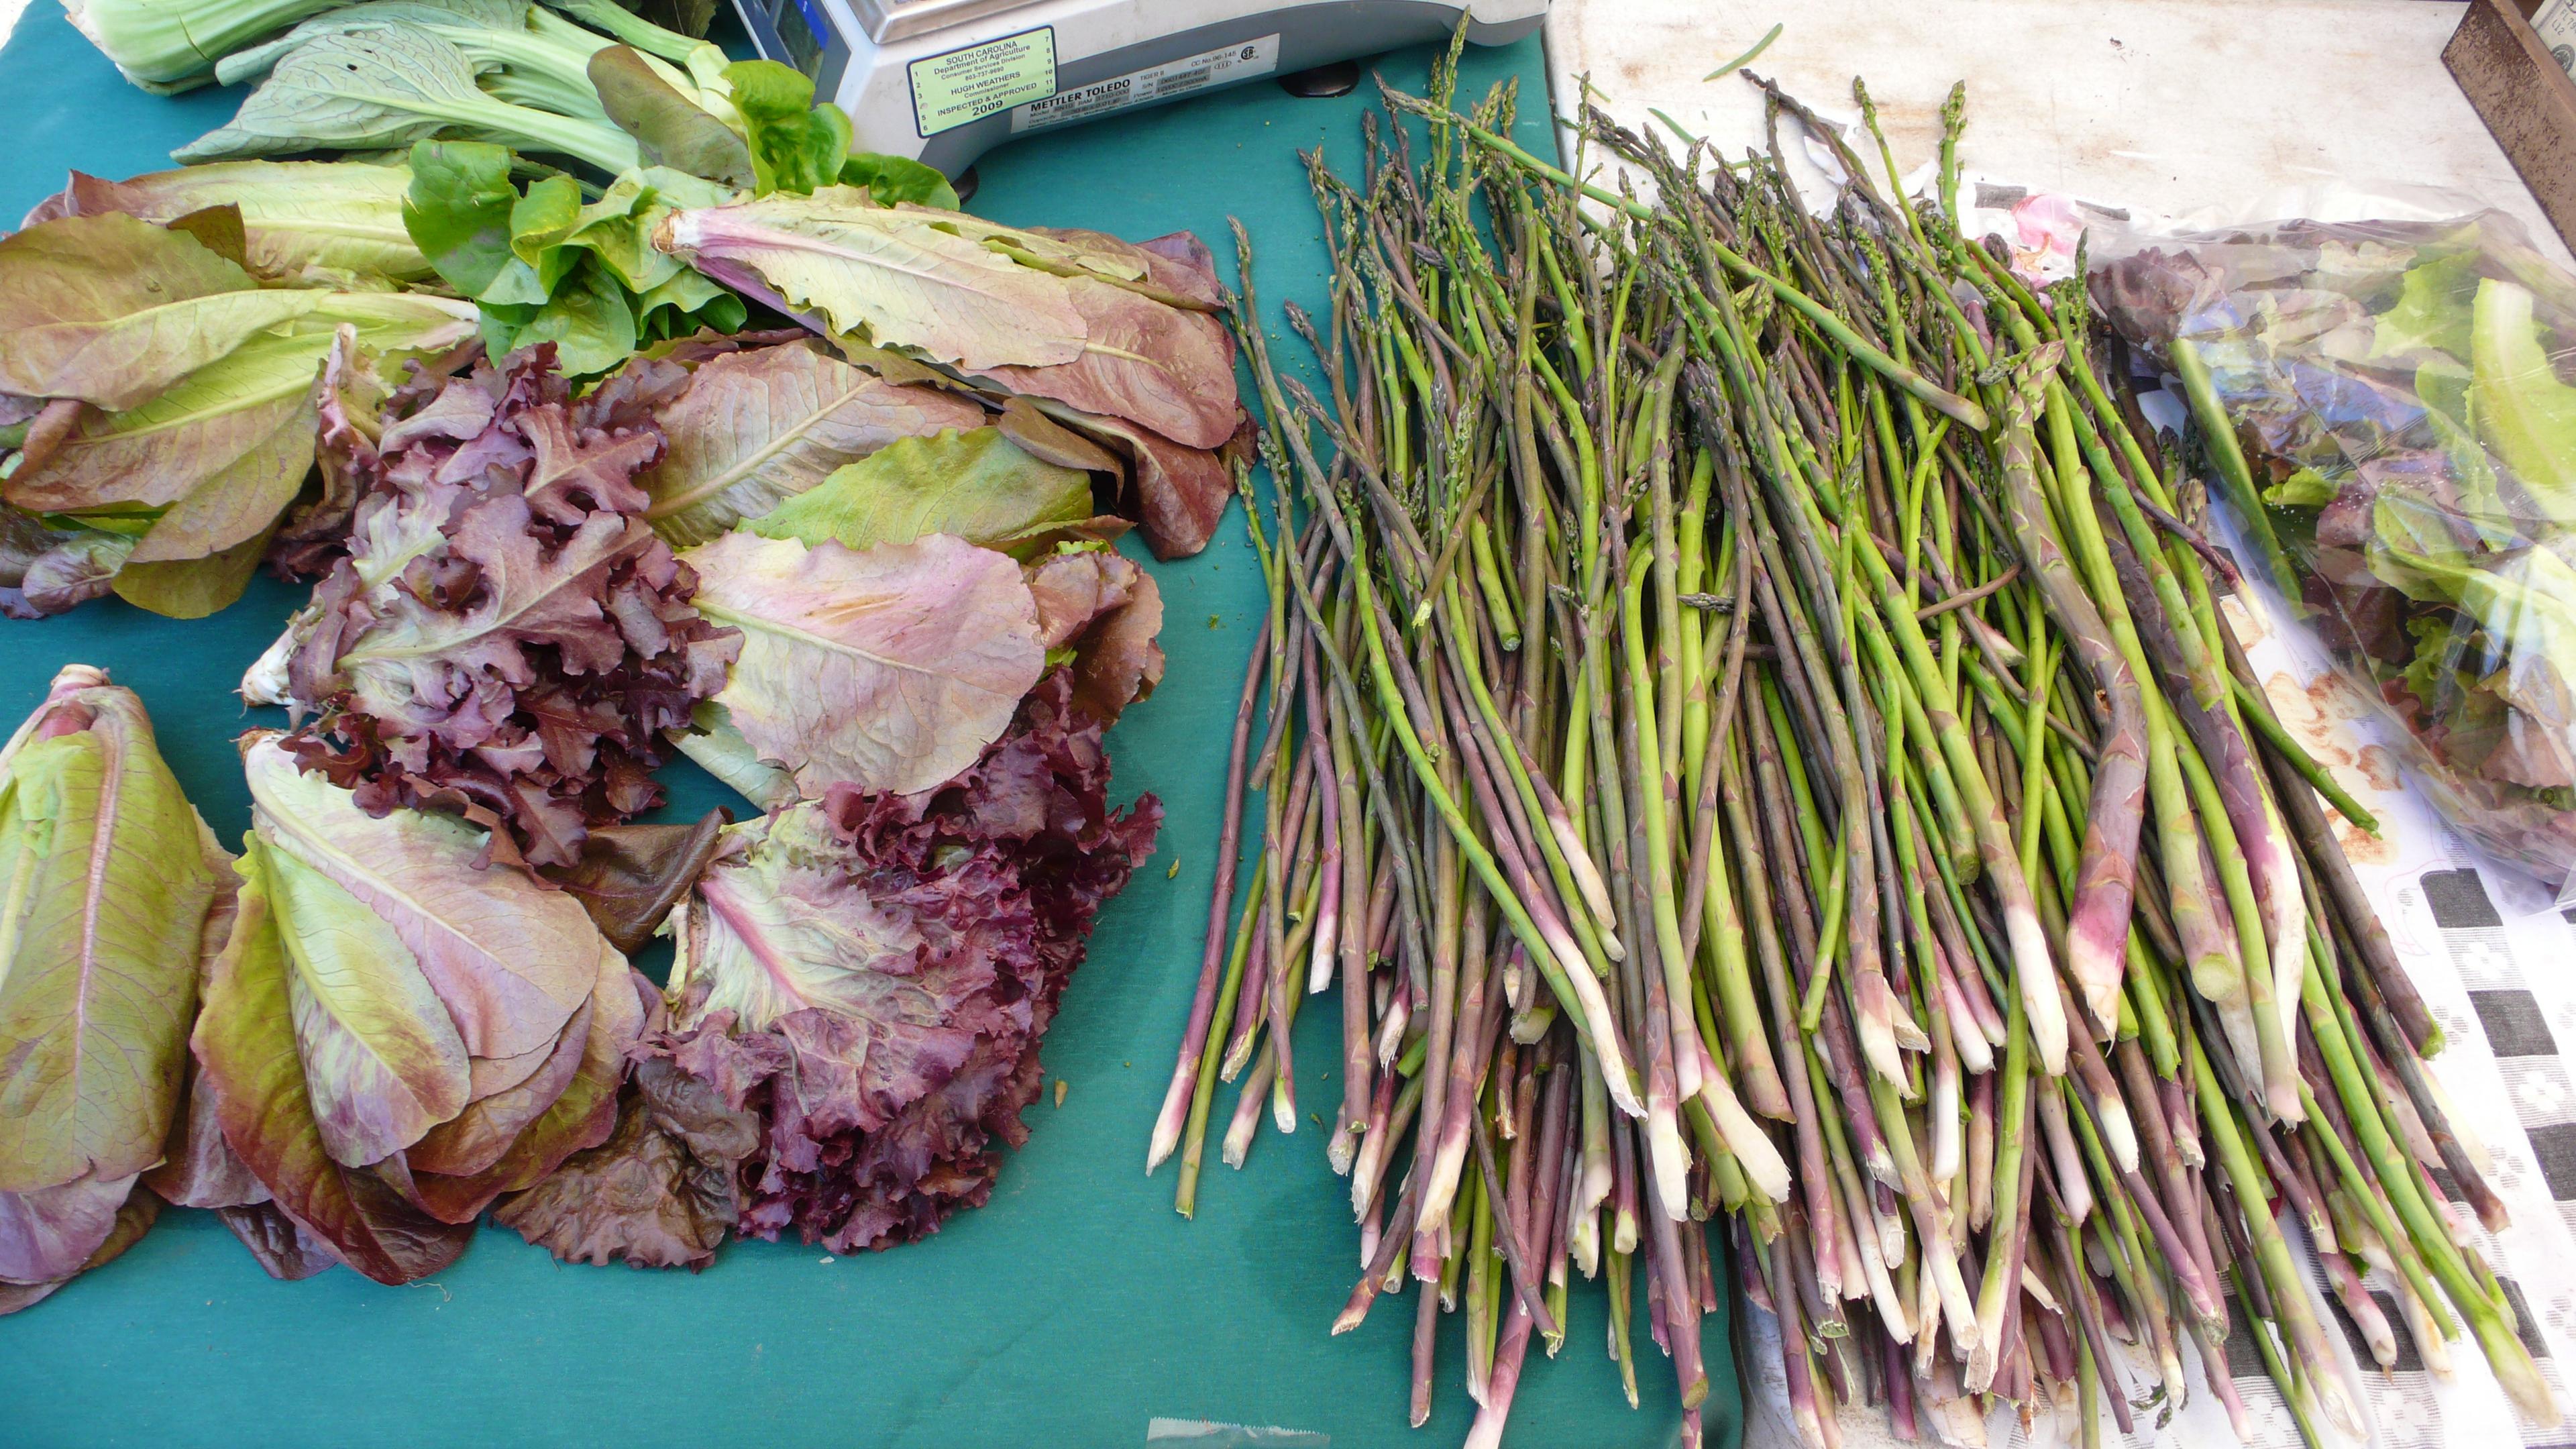 asparagus and lettuce